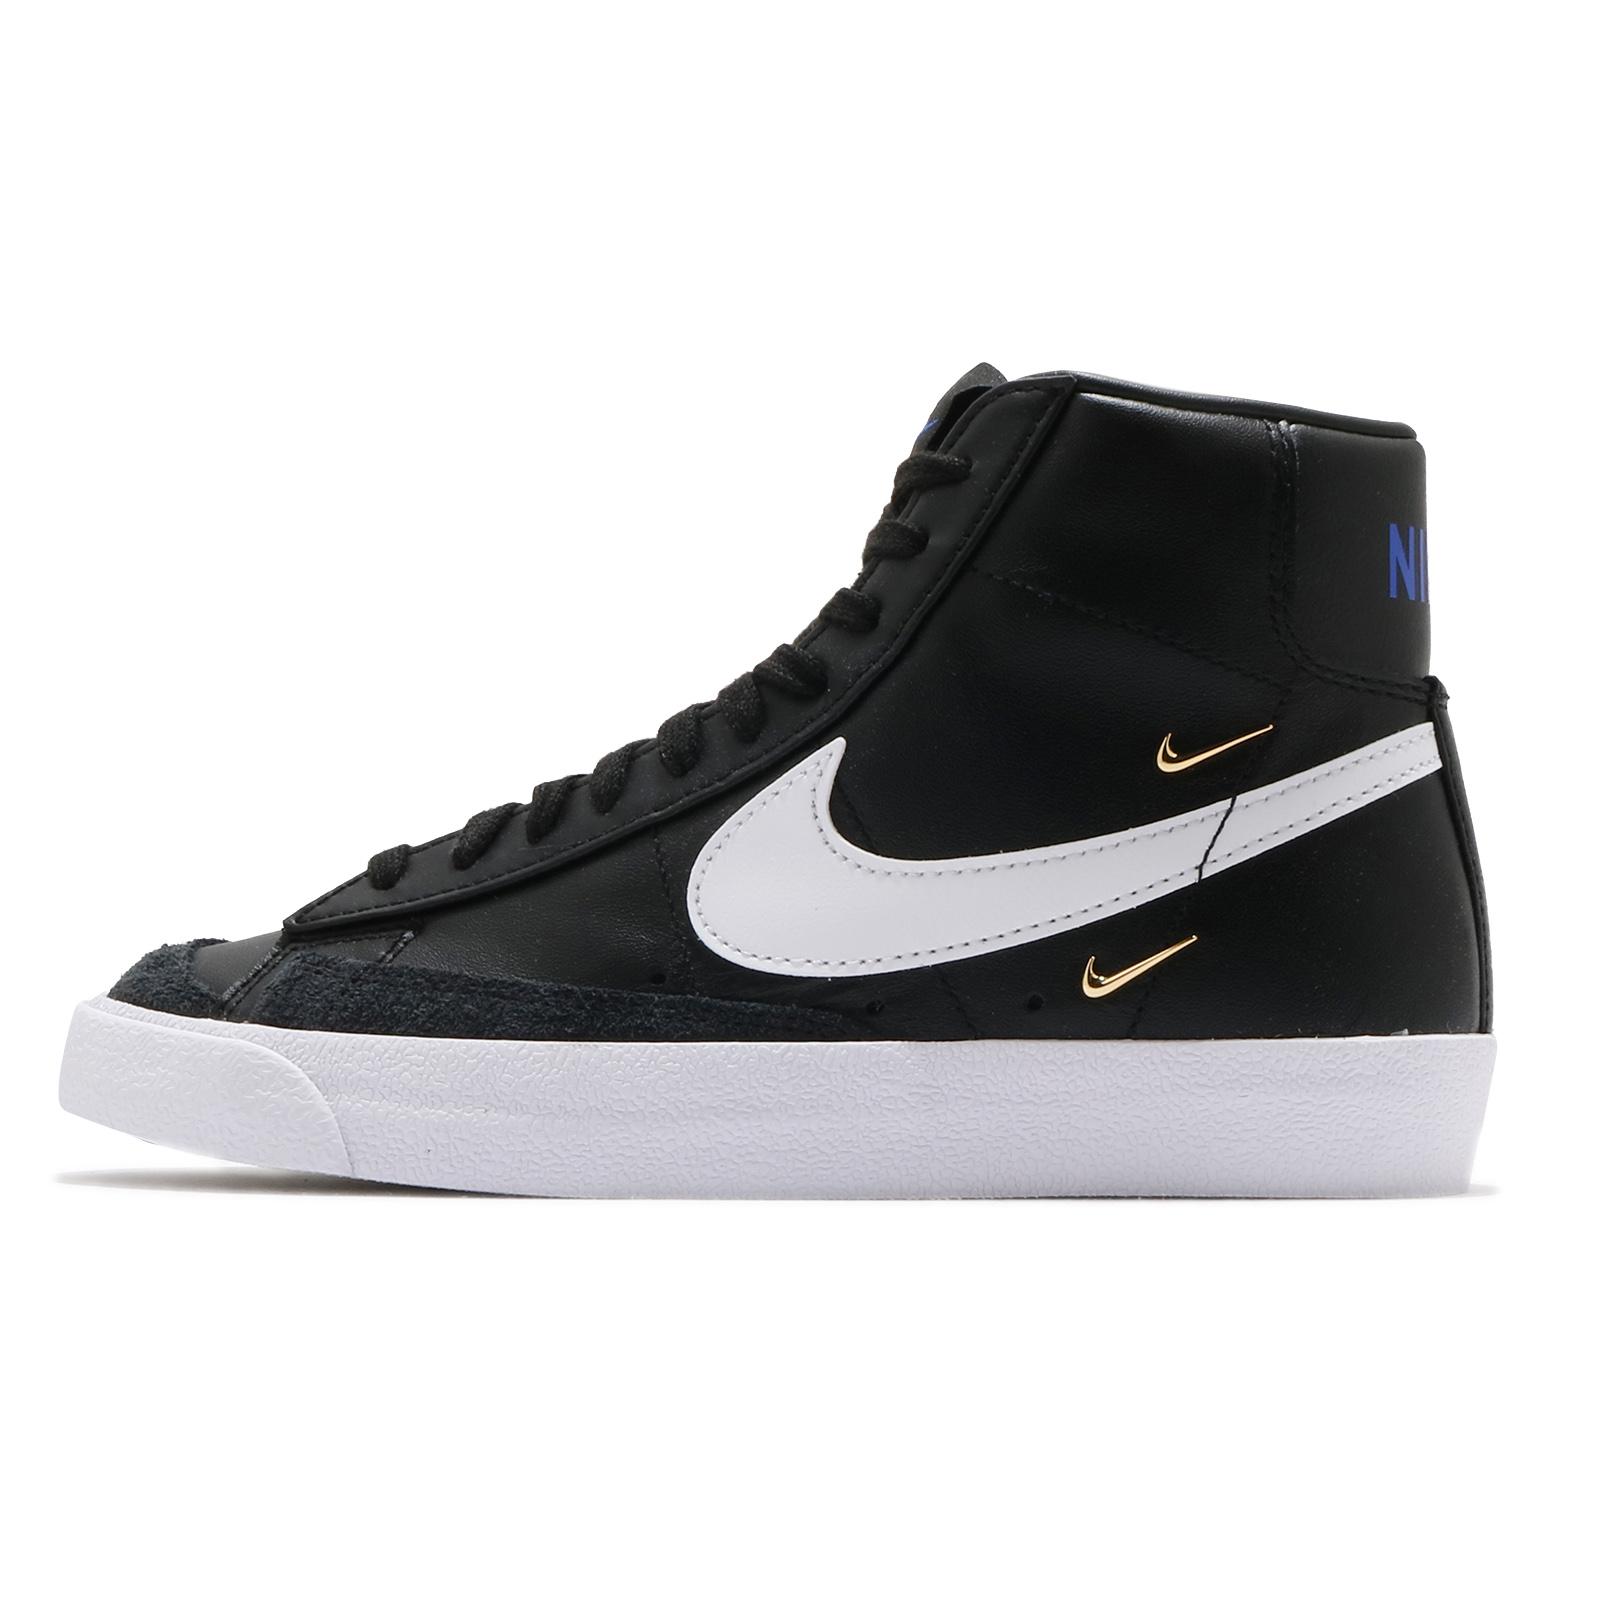 Nike 休閒鞋 Wmns Blazer Mid 77 SE 黑 白 藍 雙金勾 女鞋 【ACS】 CZ4627-001